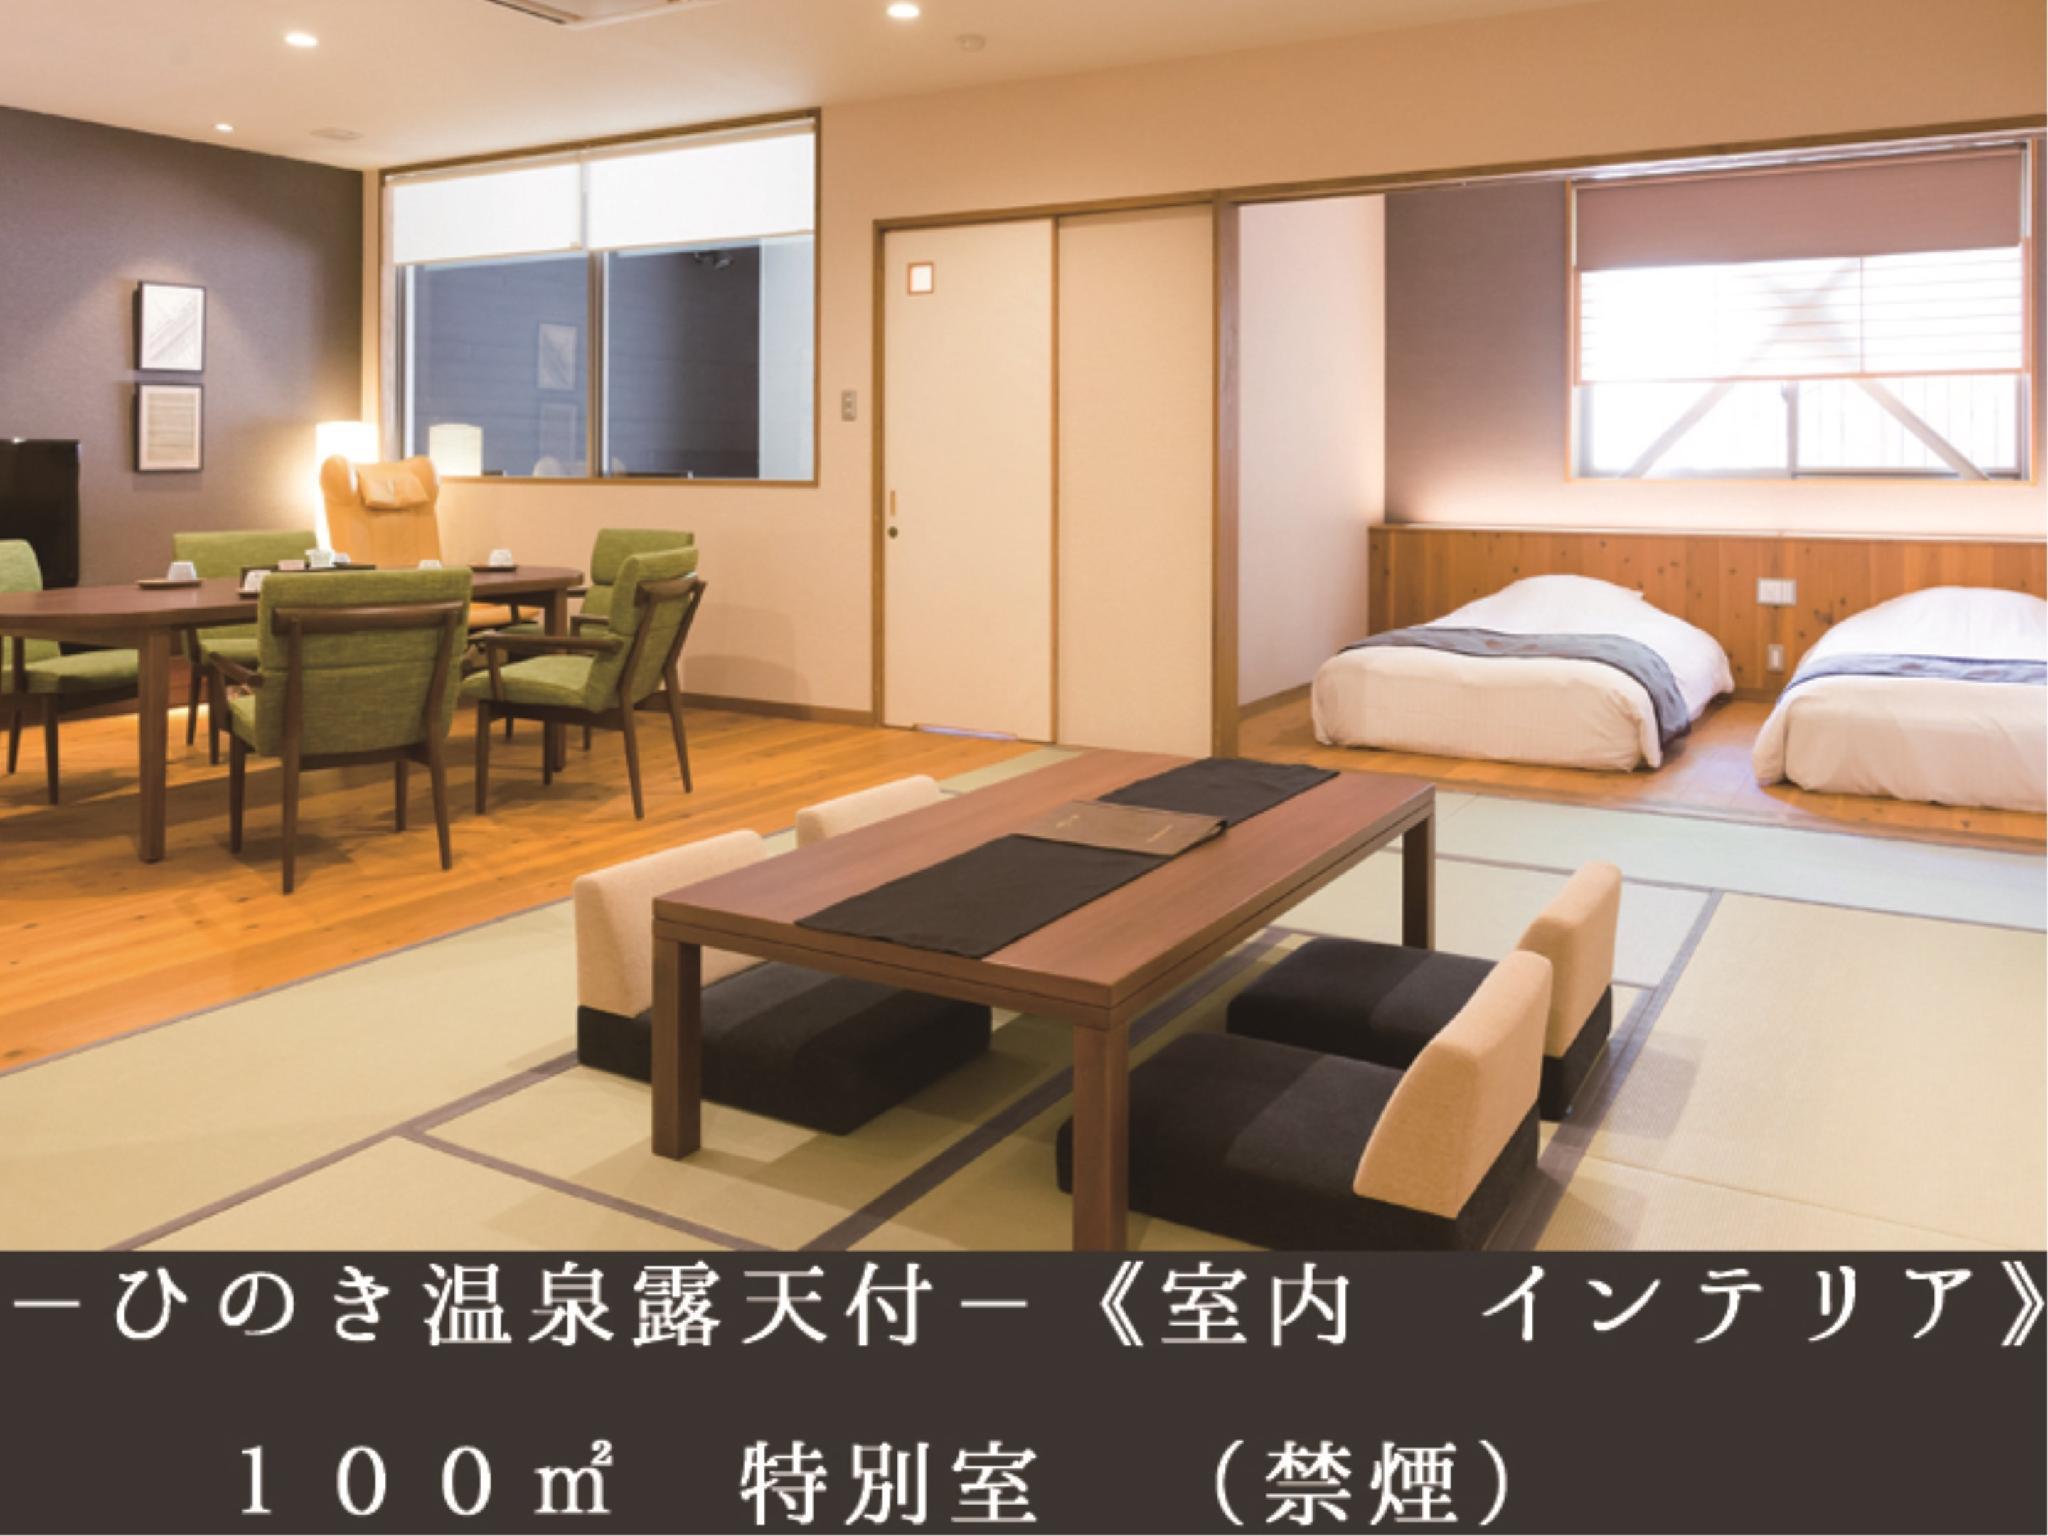 Hospitality 1000m High - Yatsugatake Hotel Fuuka, Fujimi